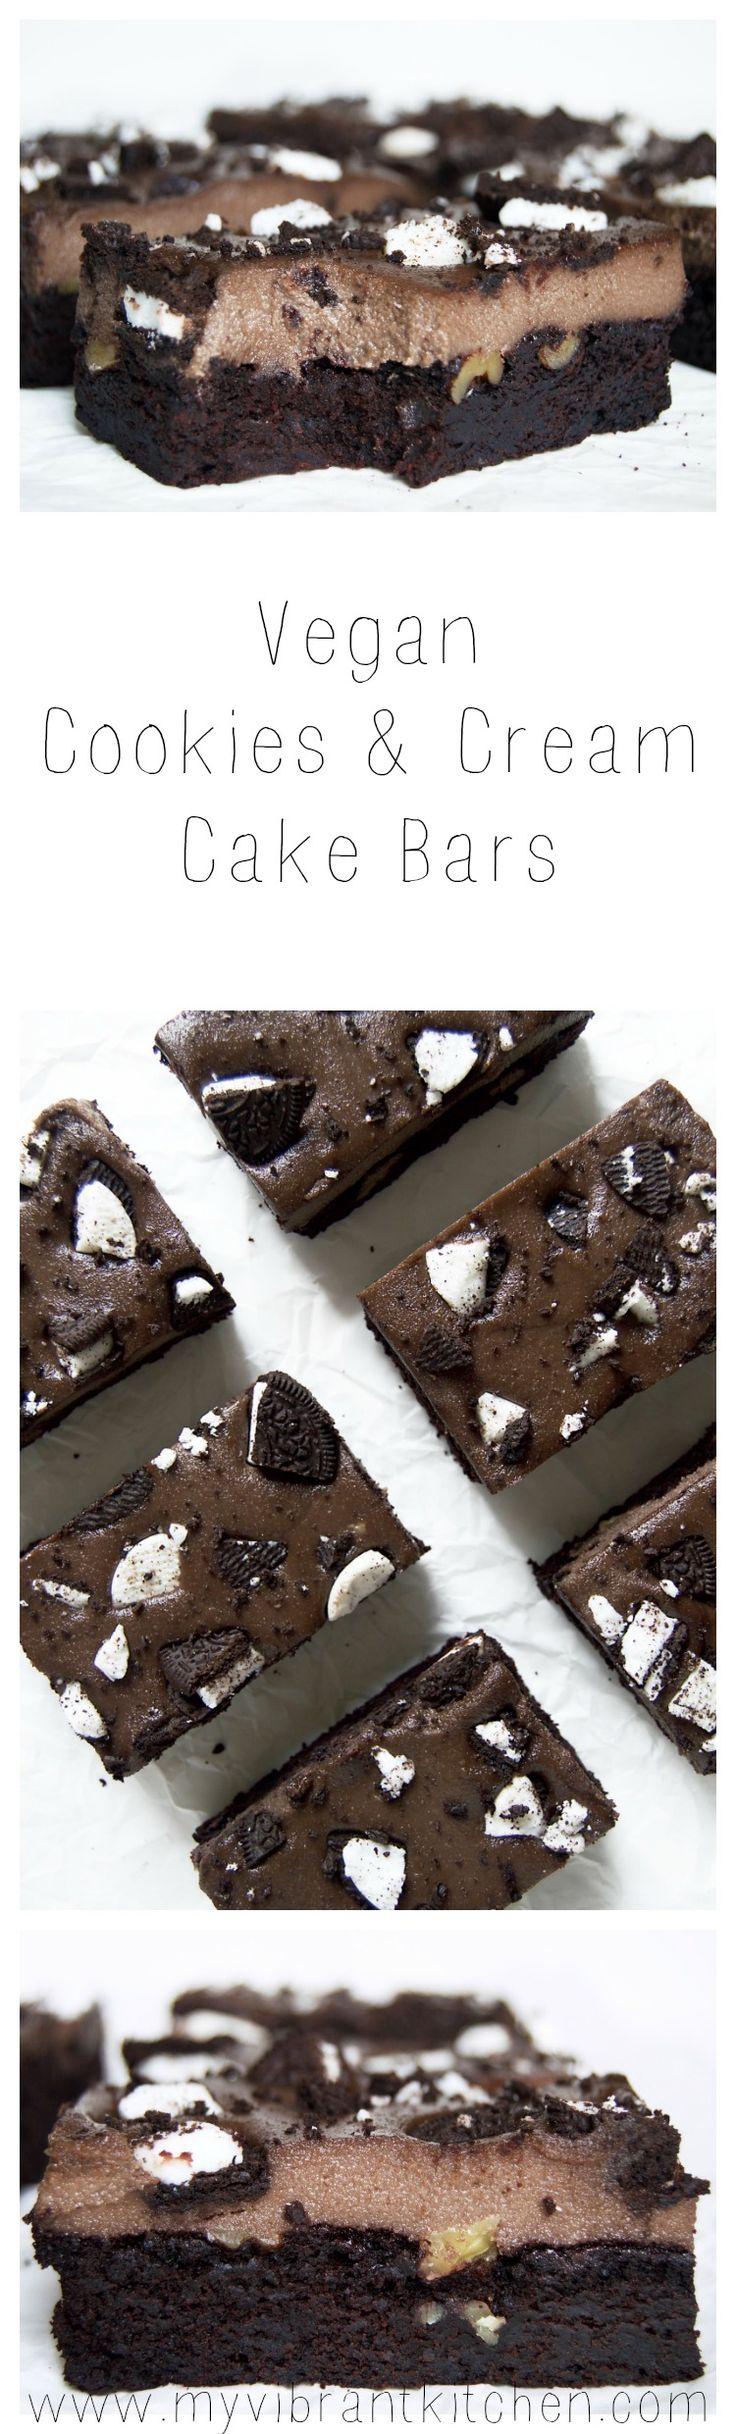 My Vibrant Kitchen | Vegan Cookies & Cream Cake Bars | myvibrantkitchen.com